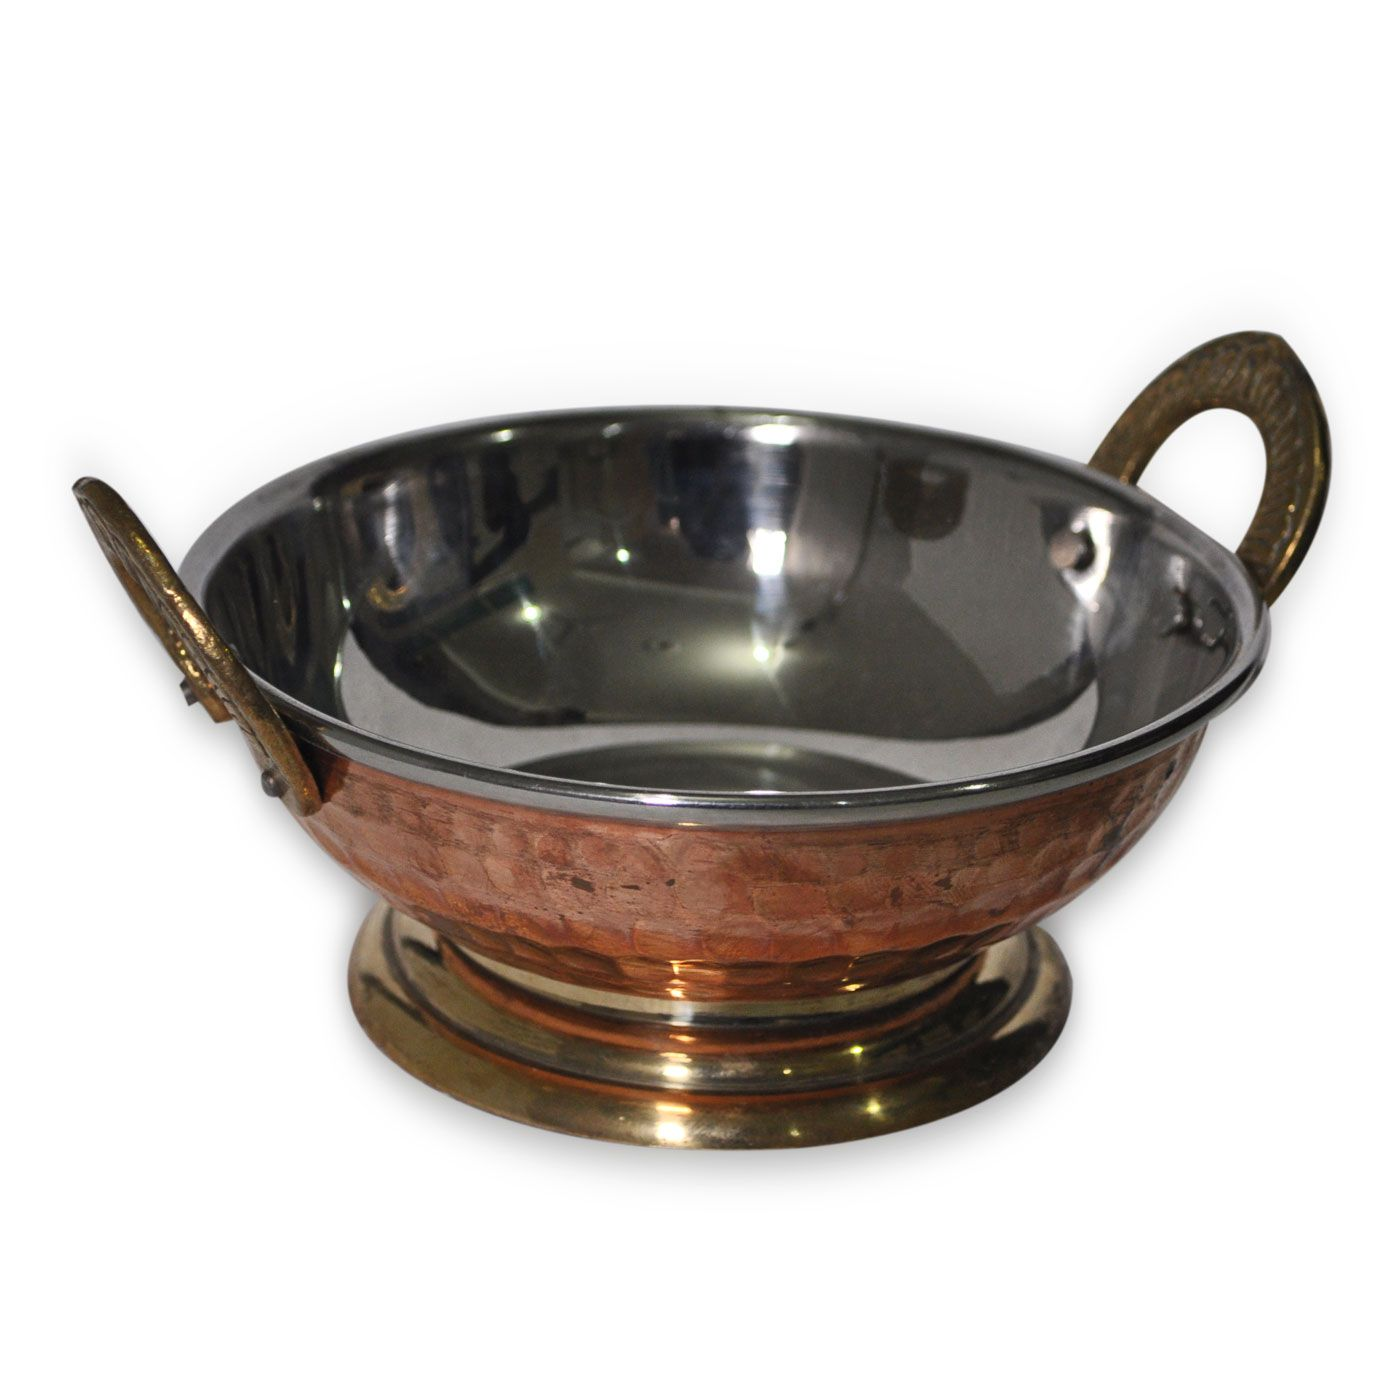 Copper Utensils India Handmade Copper Utensils Copper Tableware Copper Utensils Handmade Tableware